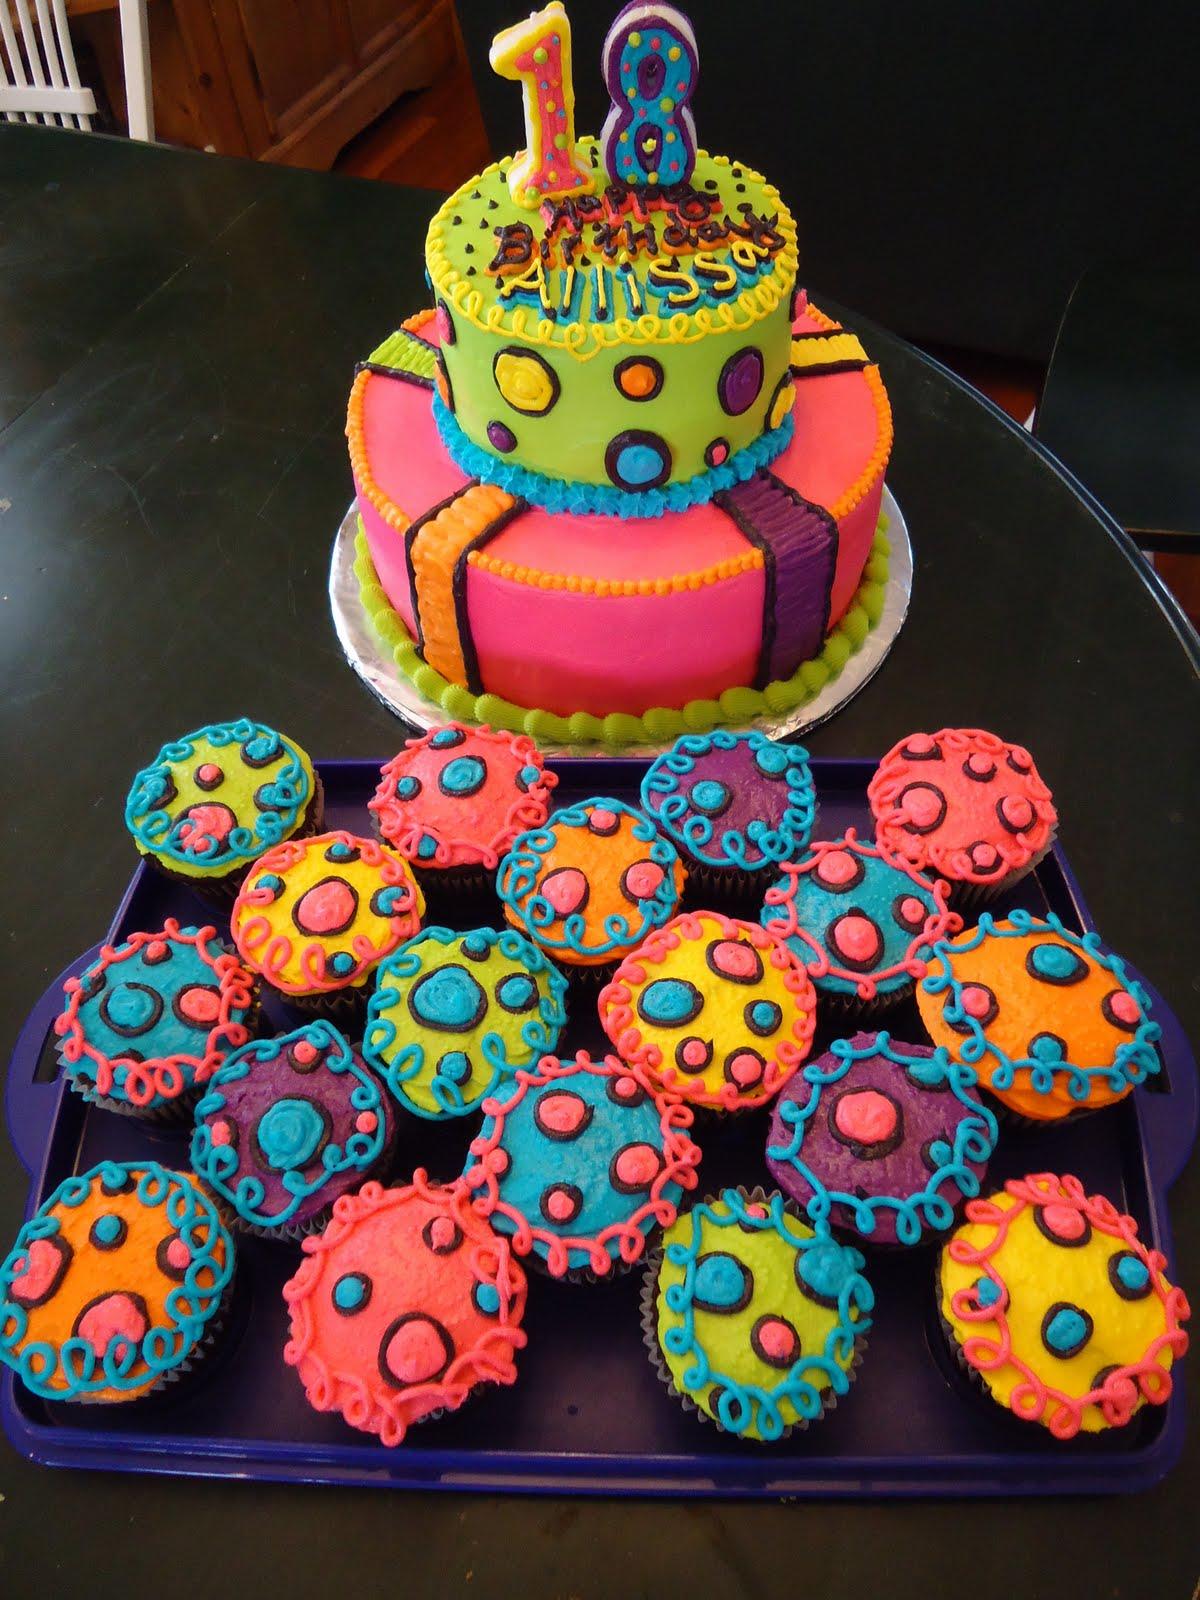 Cats Cake Creations NEON Lights BRIGHT Birthday